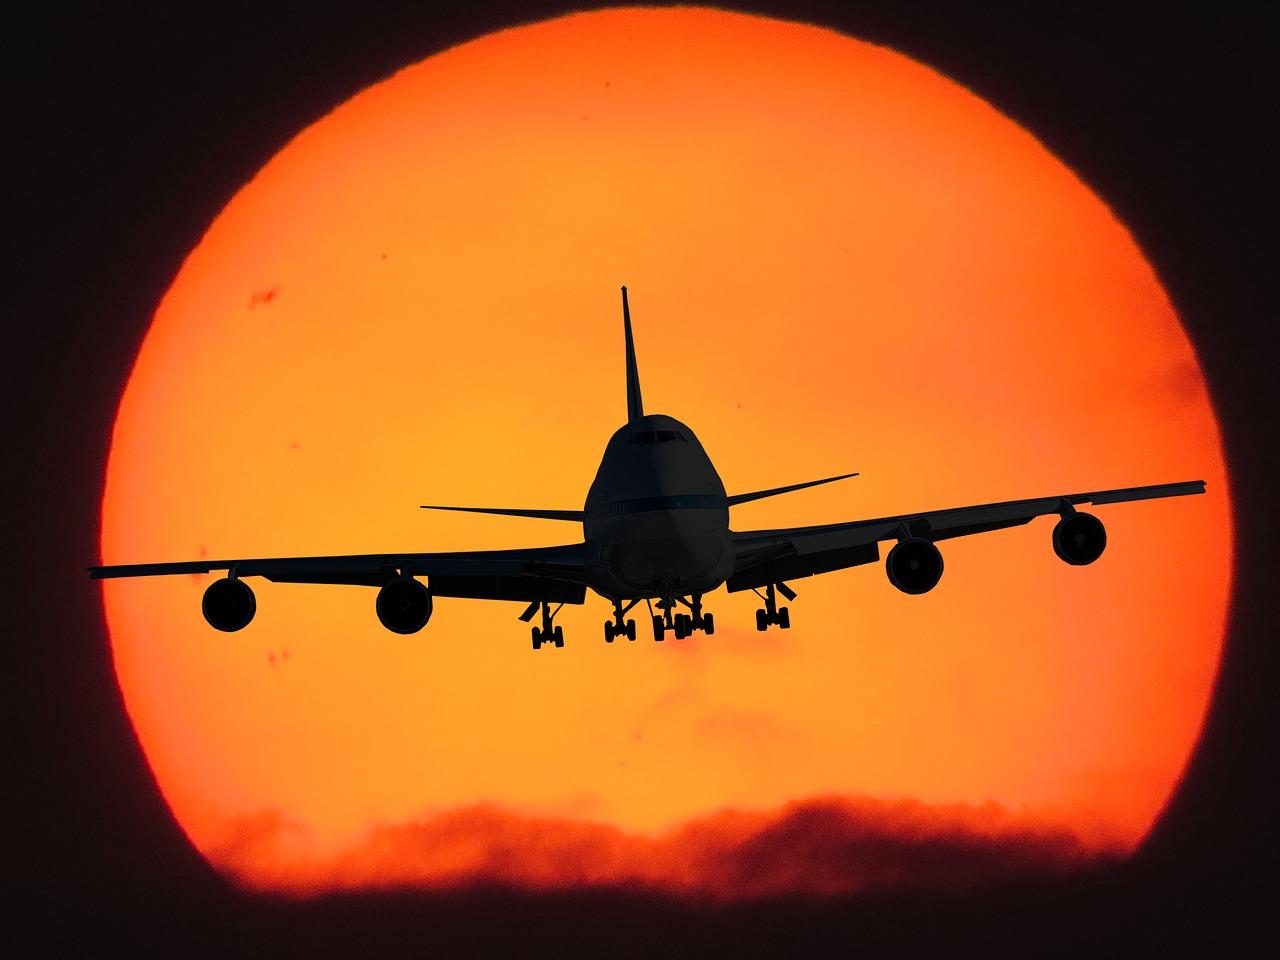 święta za granicą, samolot na tle słońca